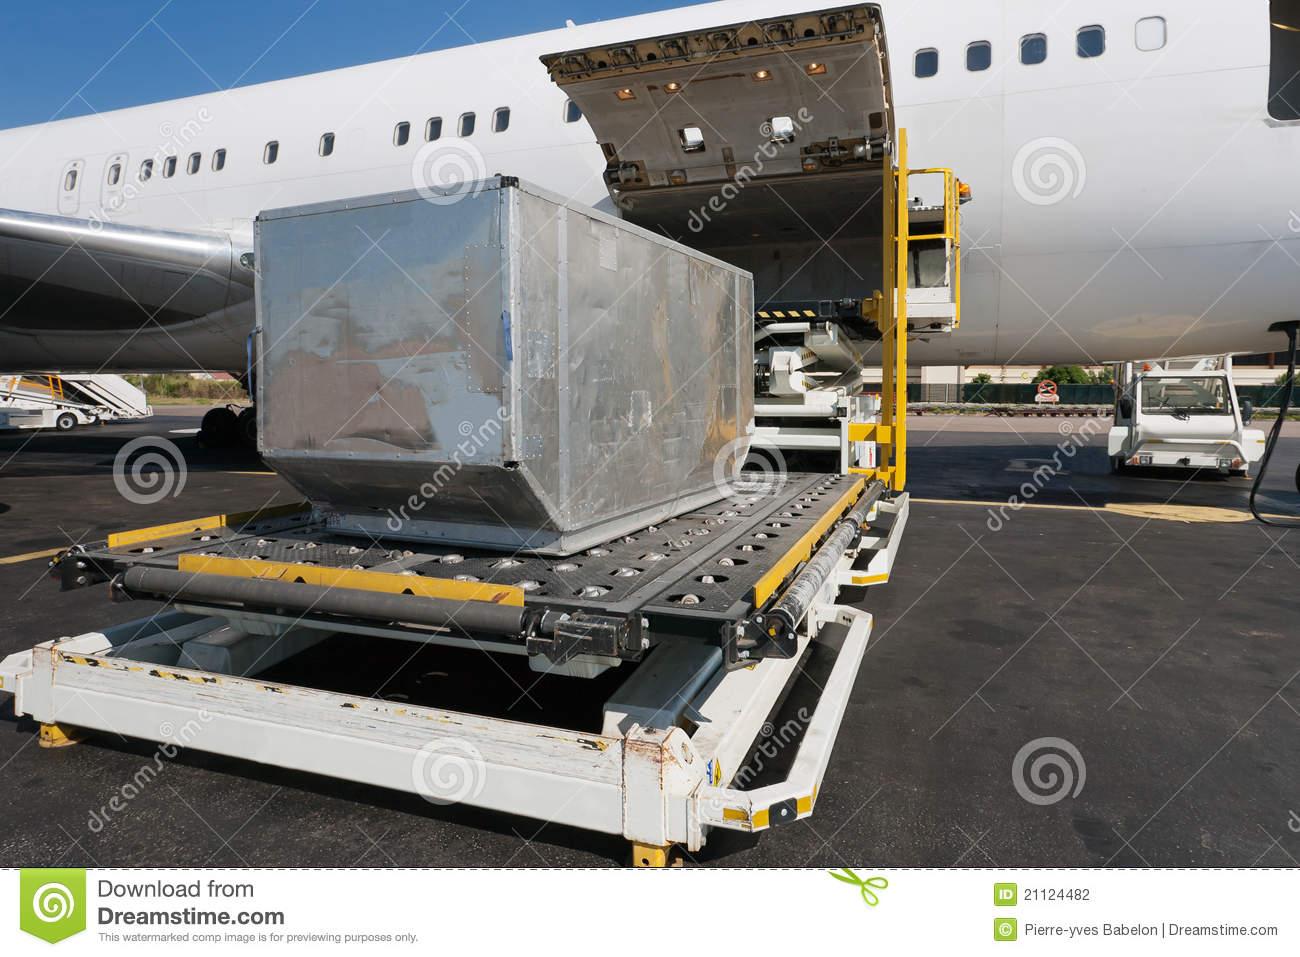 Cargo plane loading clipart jpg library Loading Cargo Plane Stock Photography - Image: 21124482 jpg library